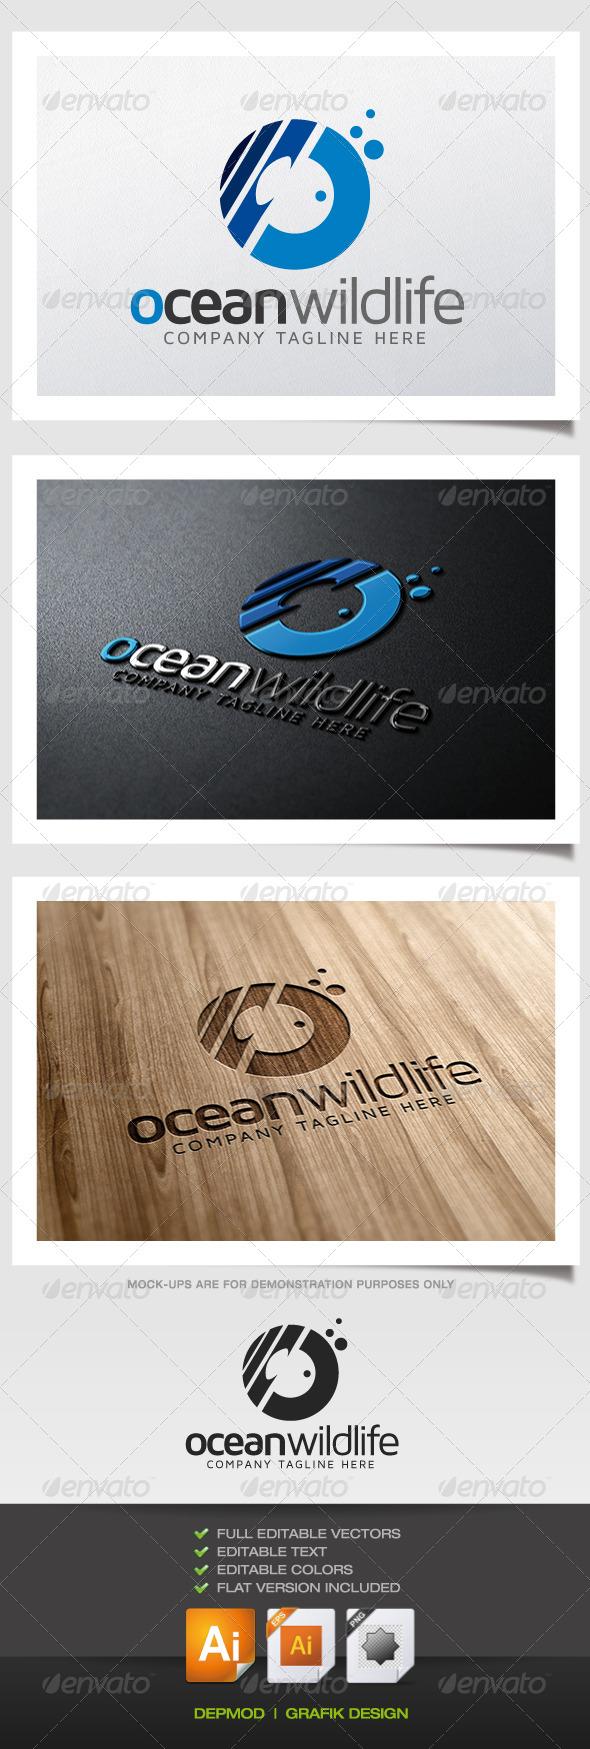 Ocean Wildlife Logo